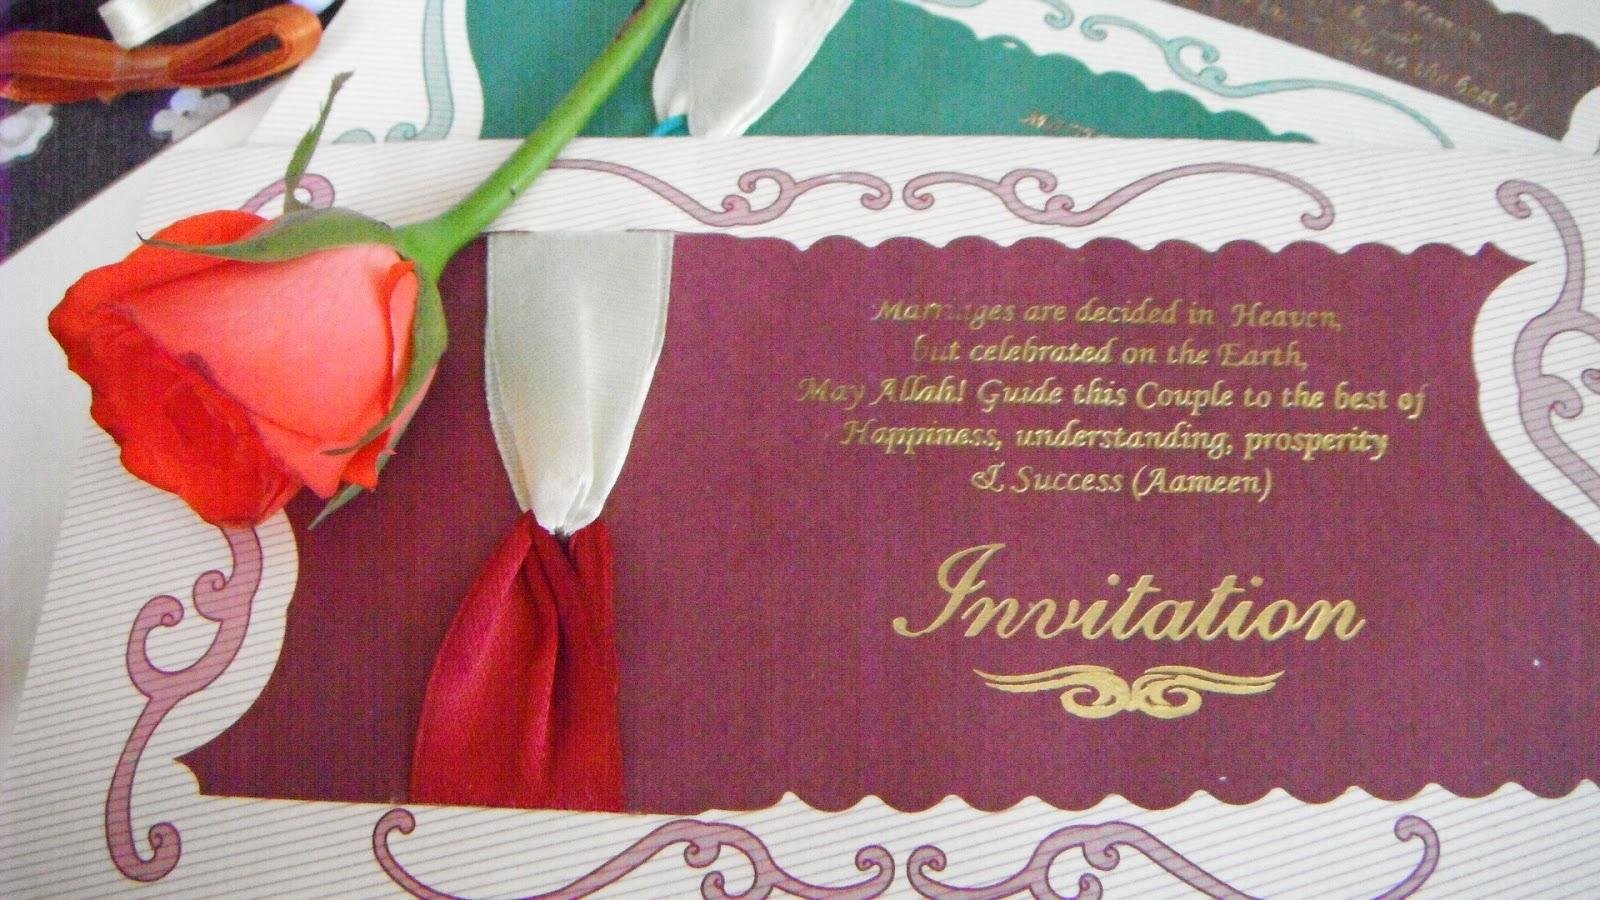 Pakistani+Wedding+Cards+Printers+Pakistani+Shaadi+CardsPrinters+Pakistani+Wedding+Invitation+Cards+Printers+in+Karachi+for+Pakistanis+in+USAUK+(89) al ahmed, pakistani (muslim) wedding cards printers, supplier,Wedding Invitation Cards Usa